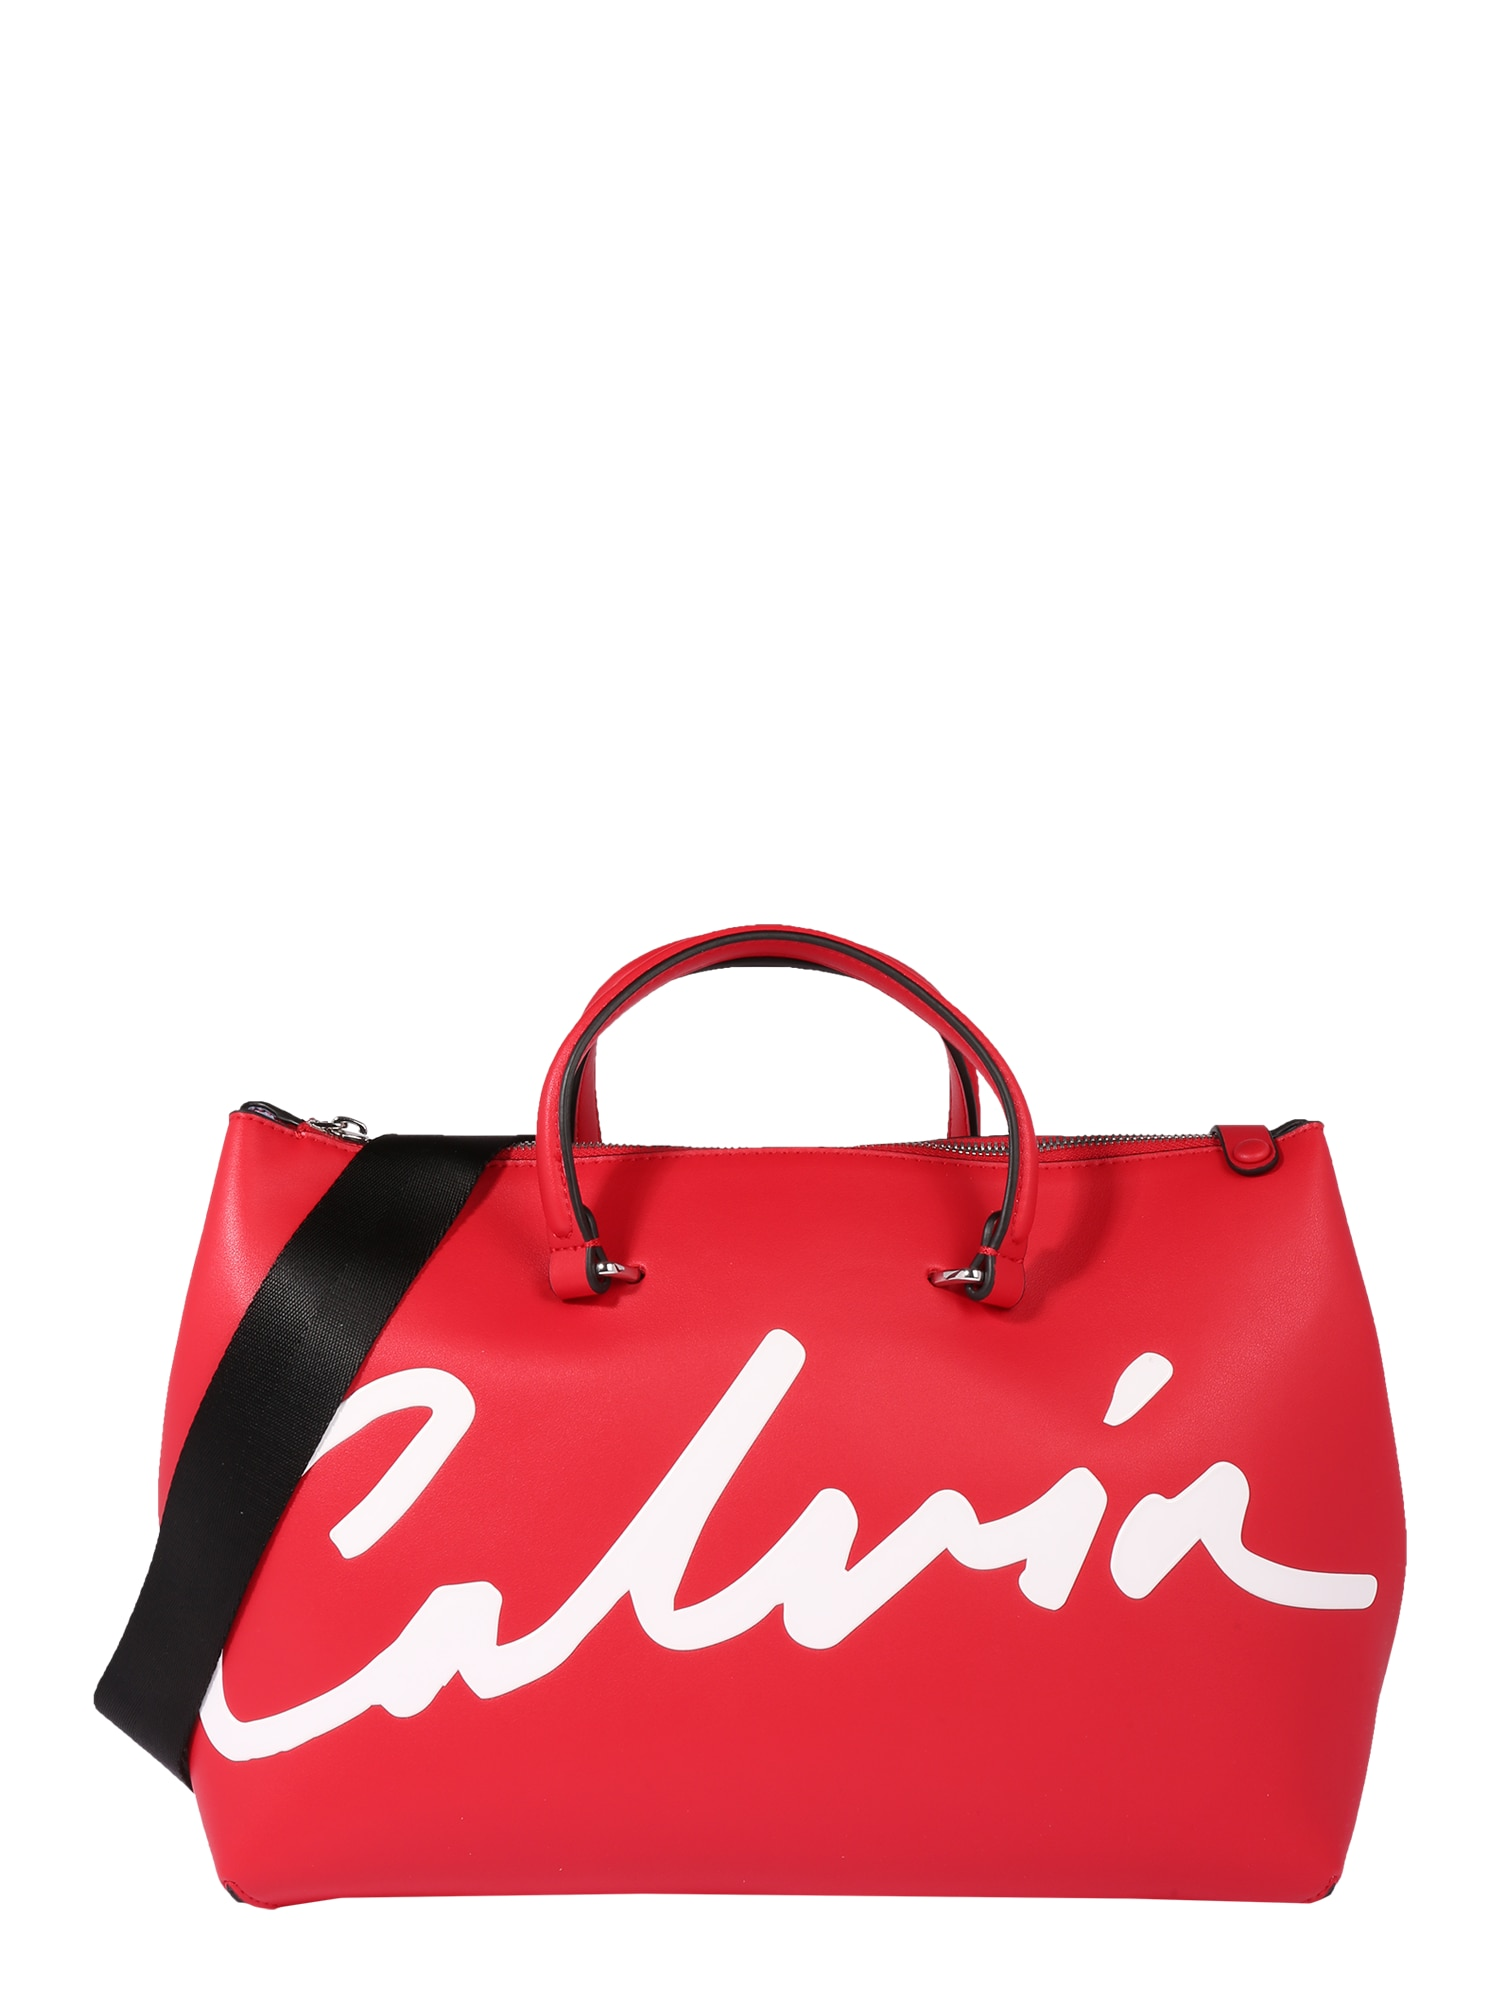 Calvin Klein Jeans Savaitgalio krepšys raudona